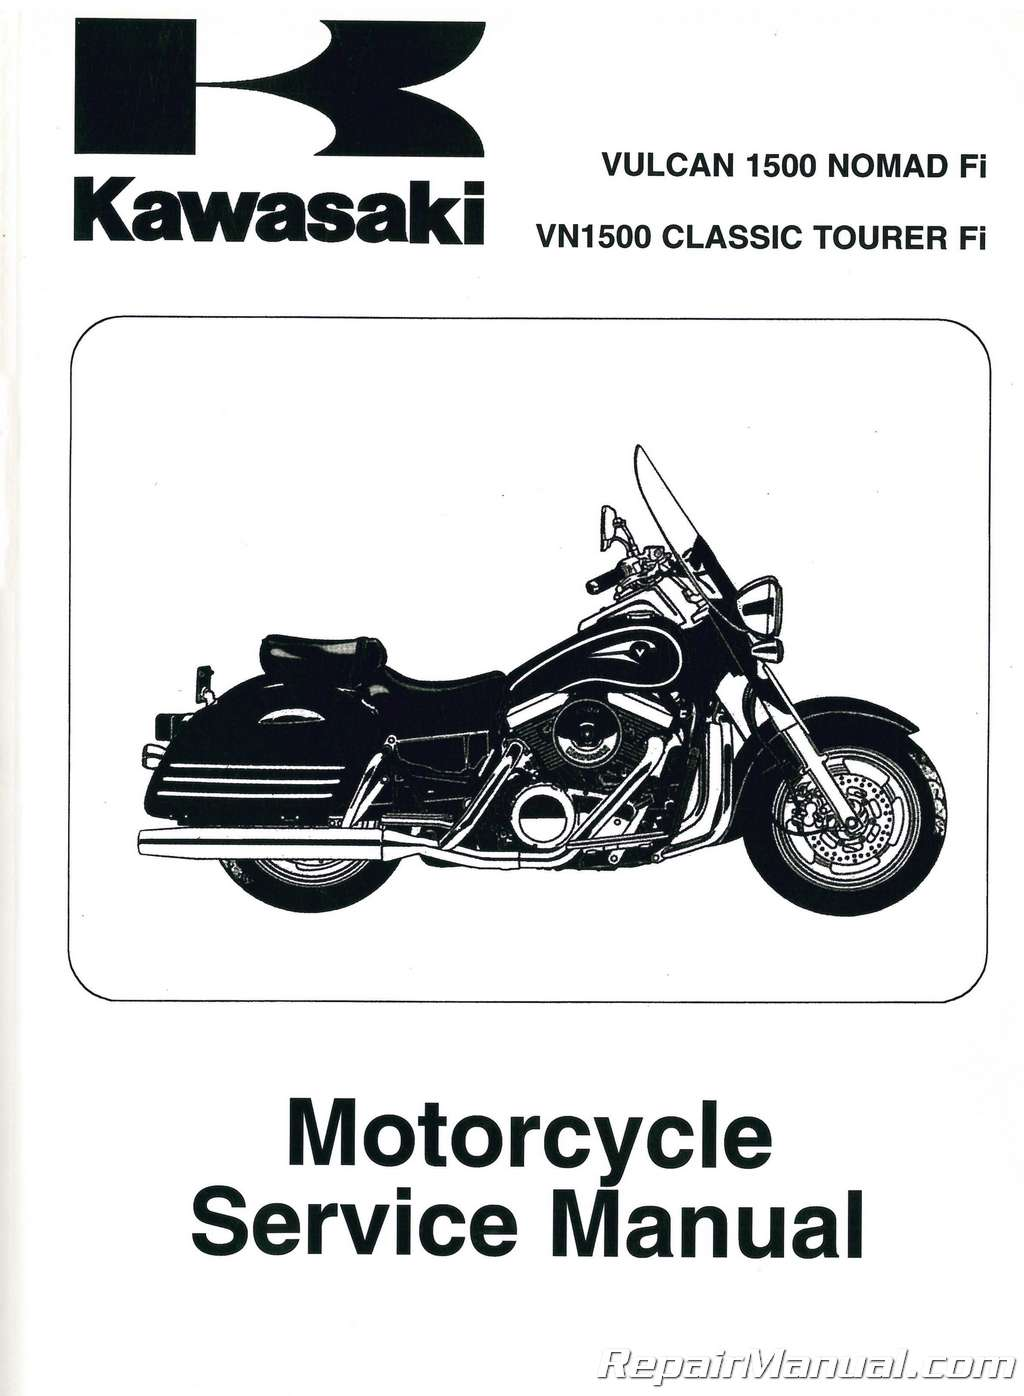 2000 kawasaki vulcan nomad 1500 owners manual